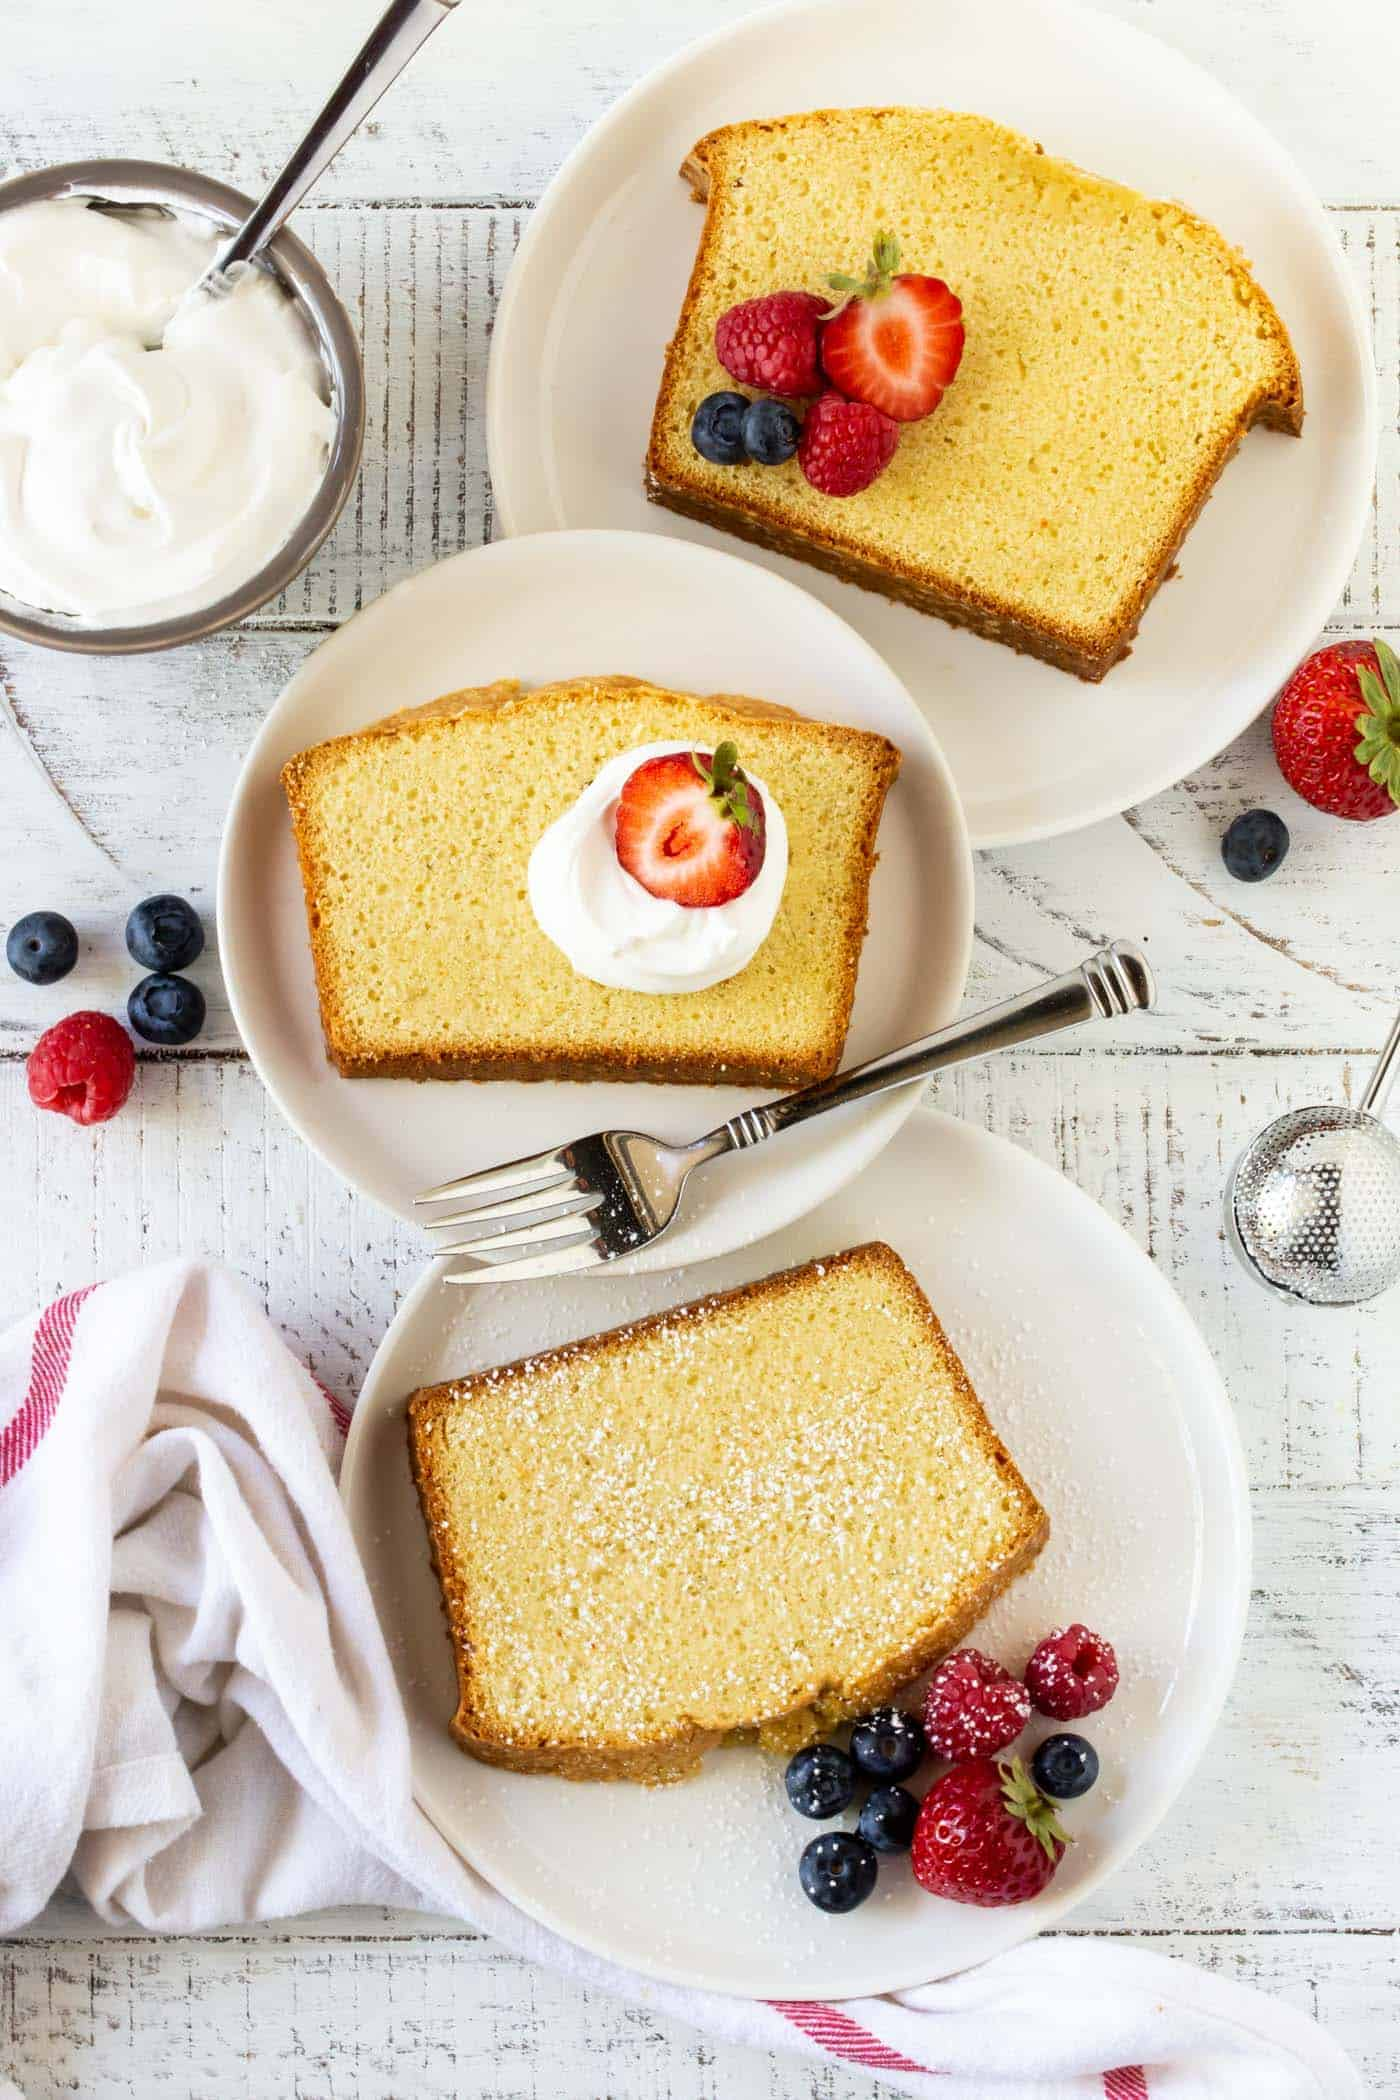 Slices of Irish Cream Pound Cake on round white plates. Garnished with fresh strawberries, raspberries, blueberries, whipped cream and powdered sugar.